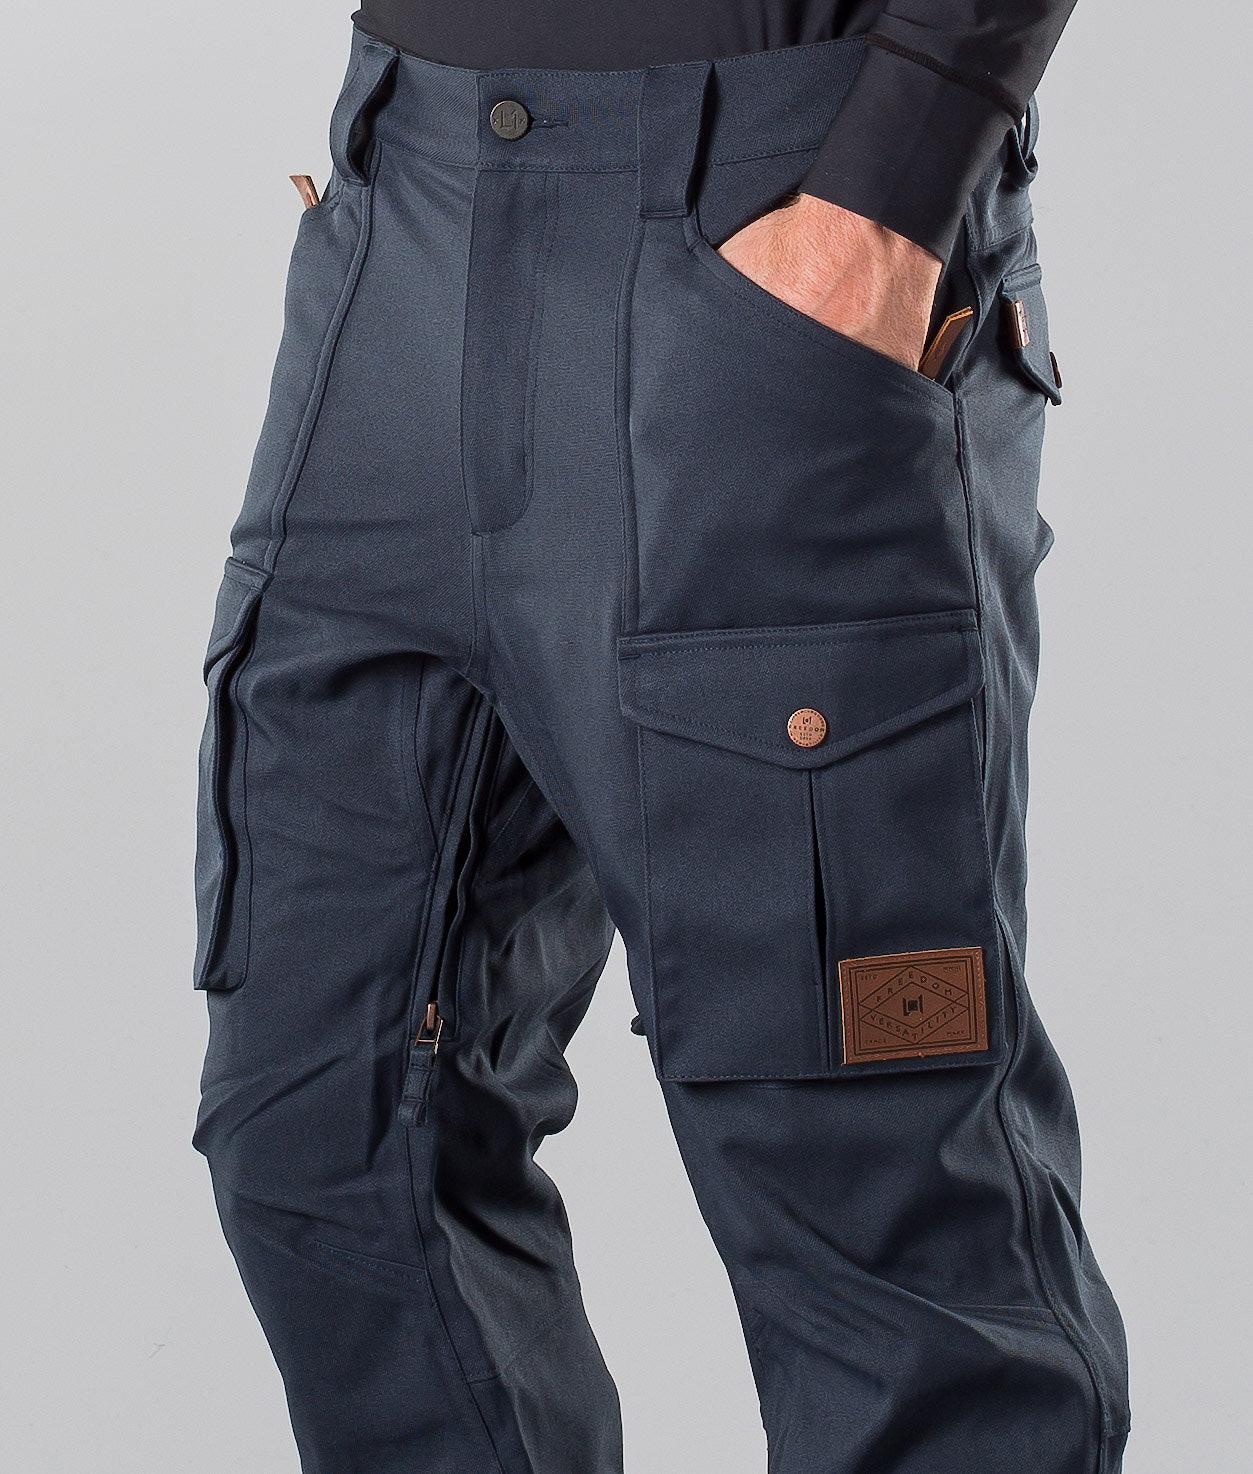 2dcd667c L1 Slim Cargo Snow Pants Ink - Ridestore.com